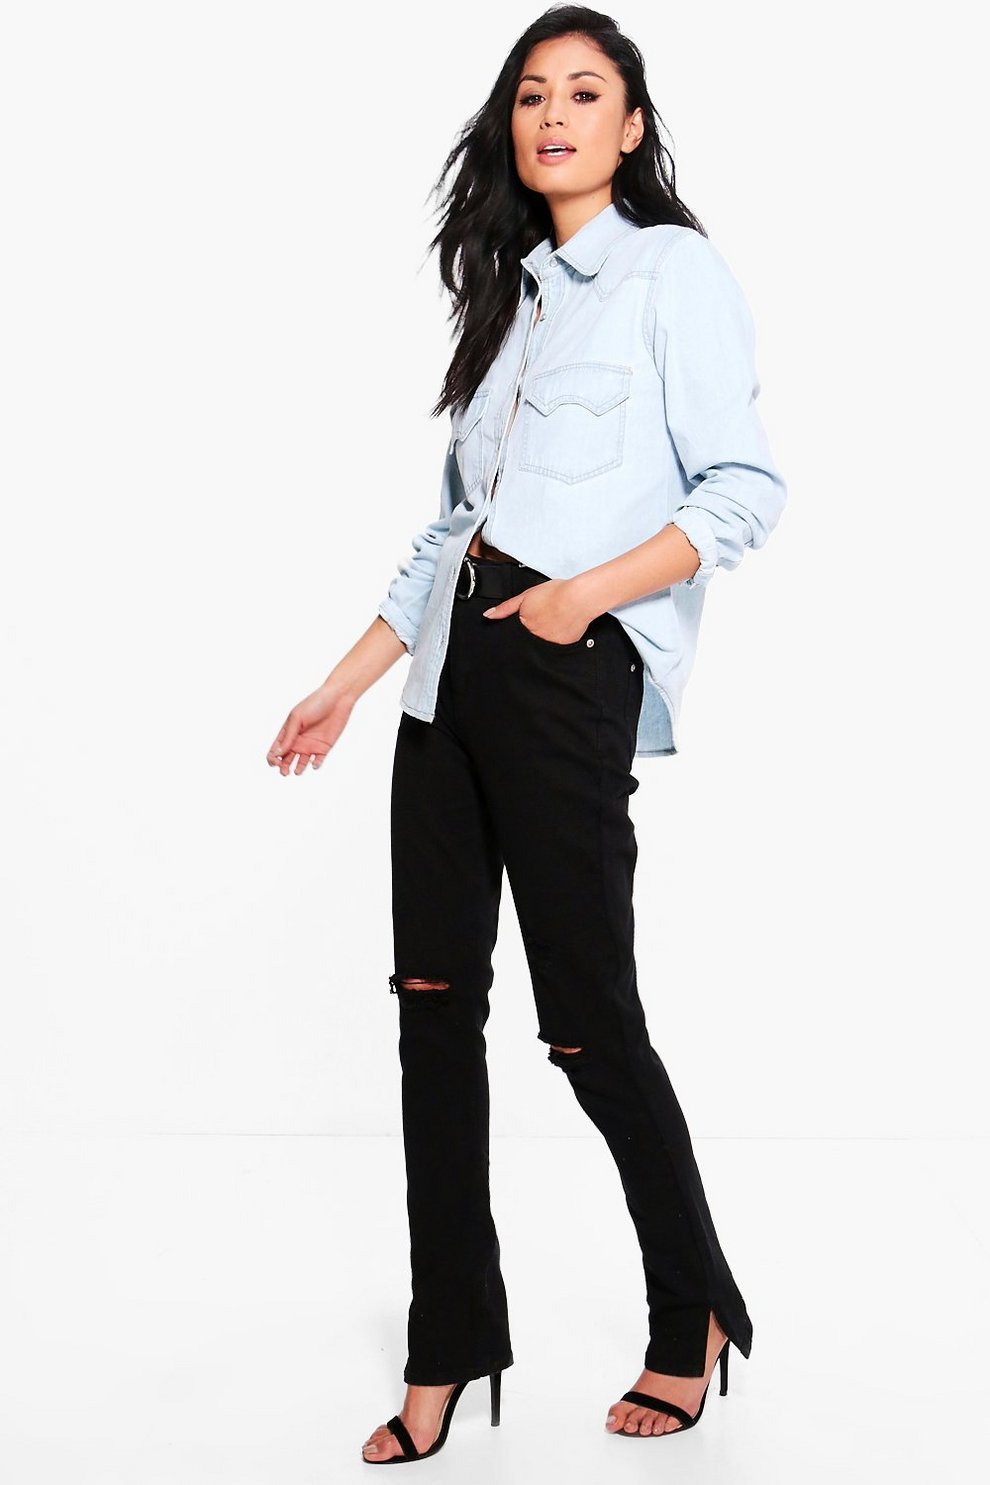 a4bd913c3aca Womens Black Abby High Waisted Distressed Kick Flare Jeans